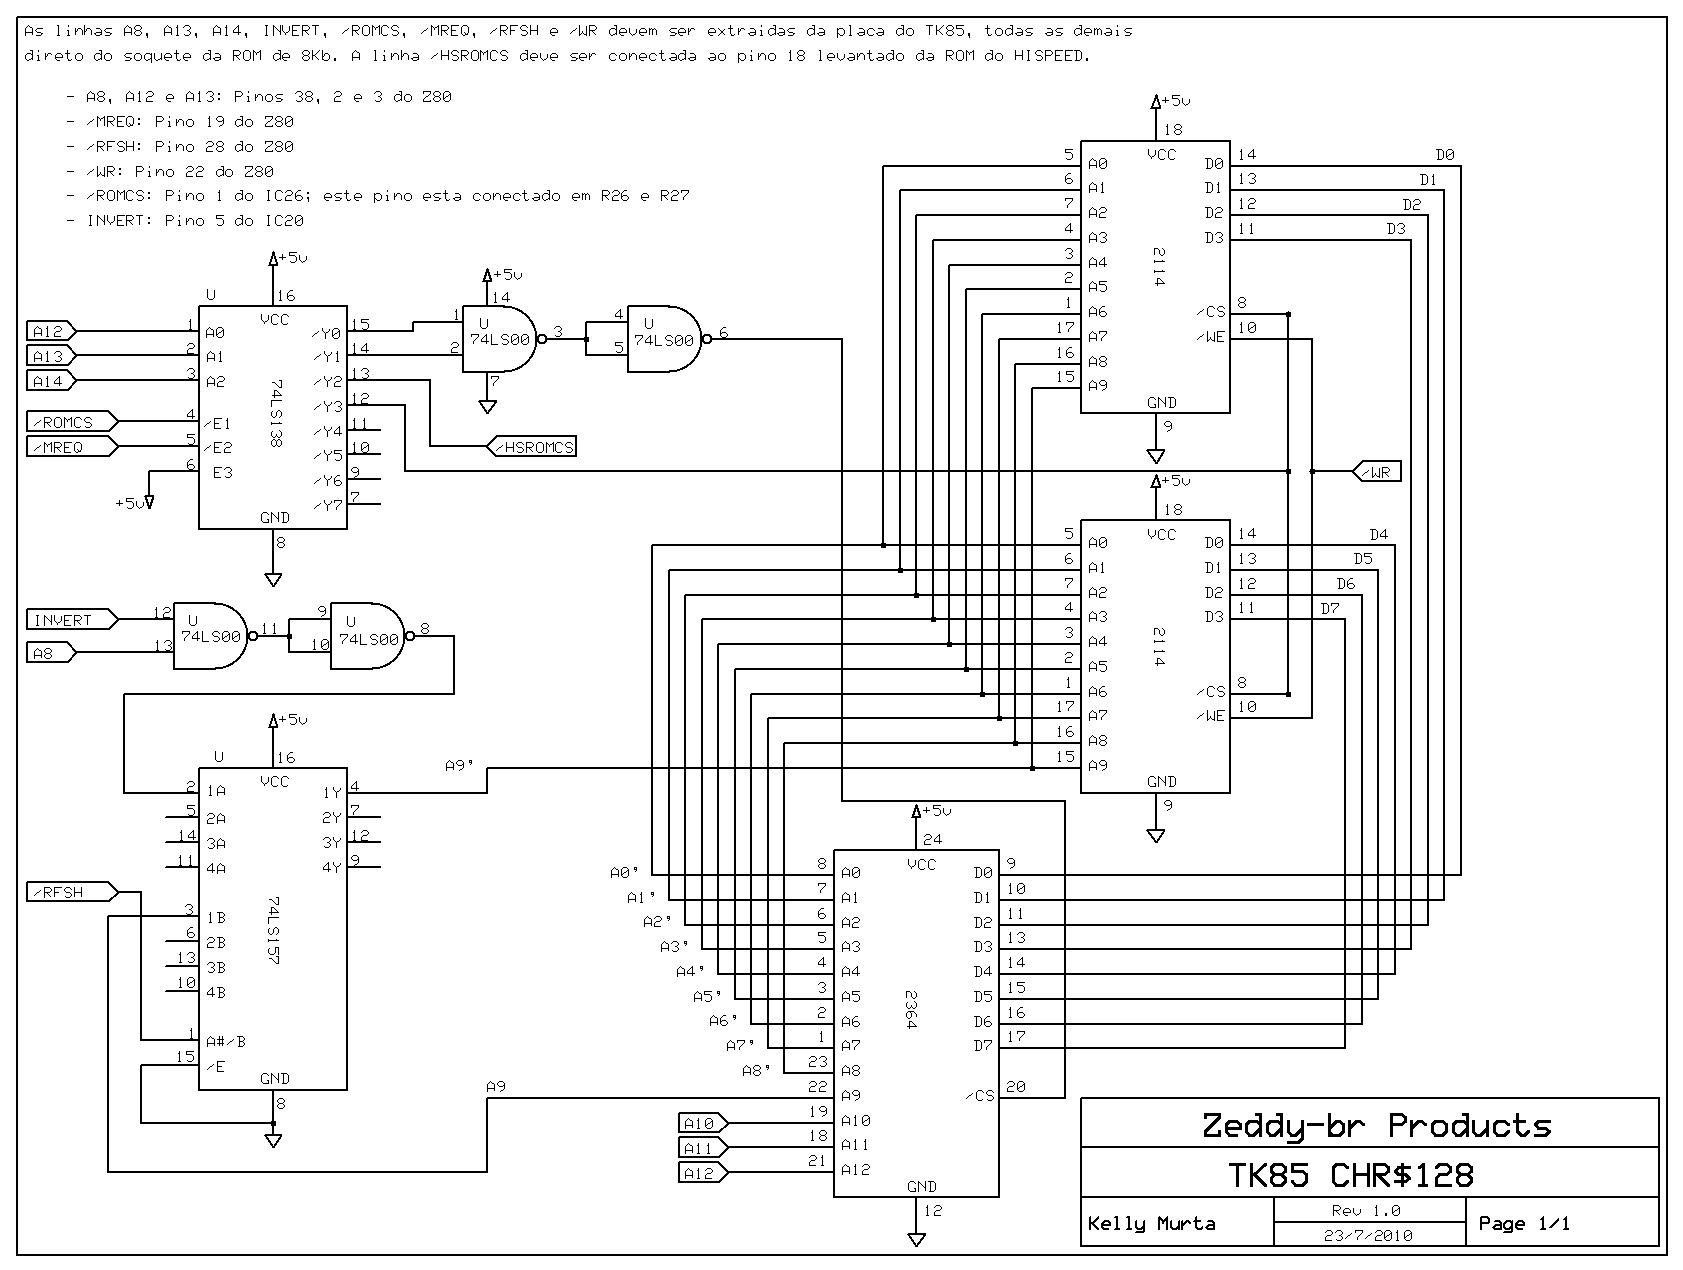 Chroma 81